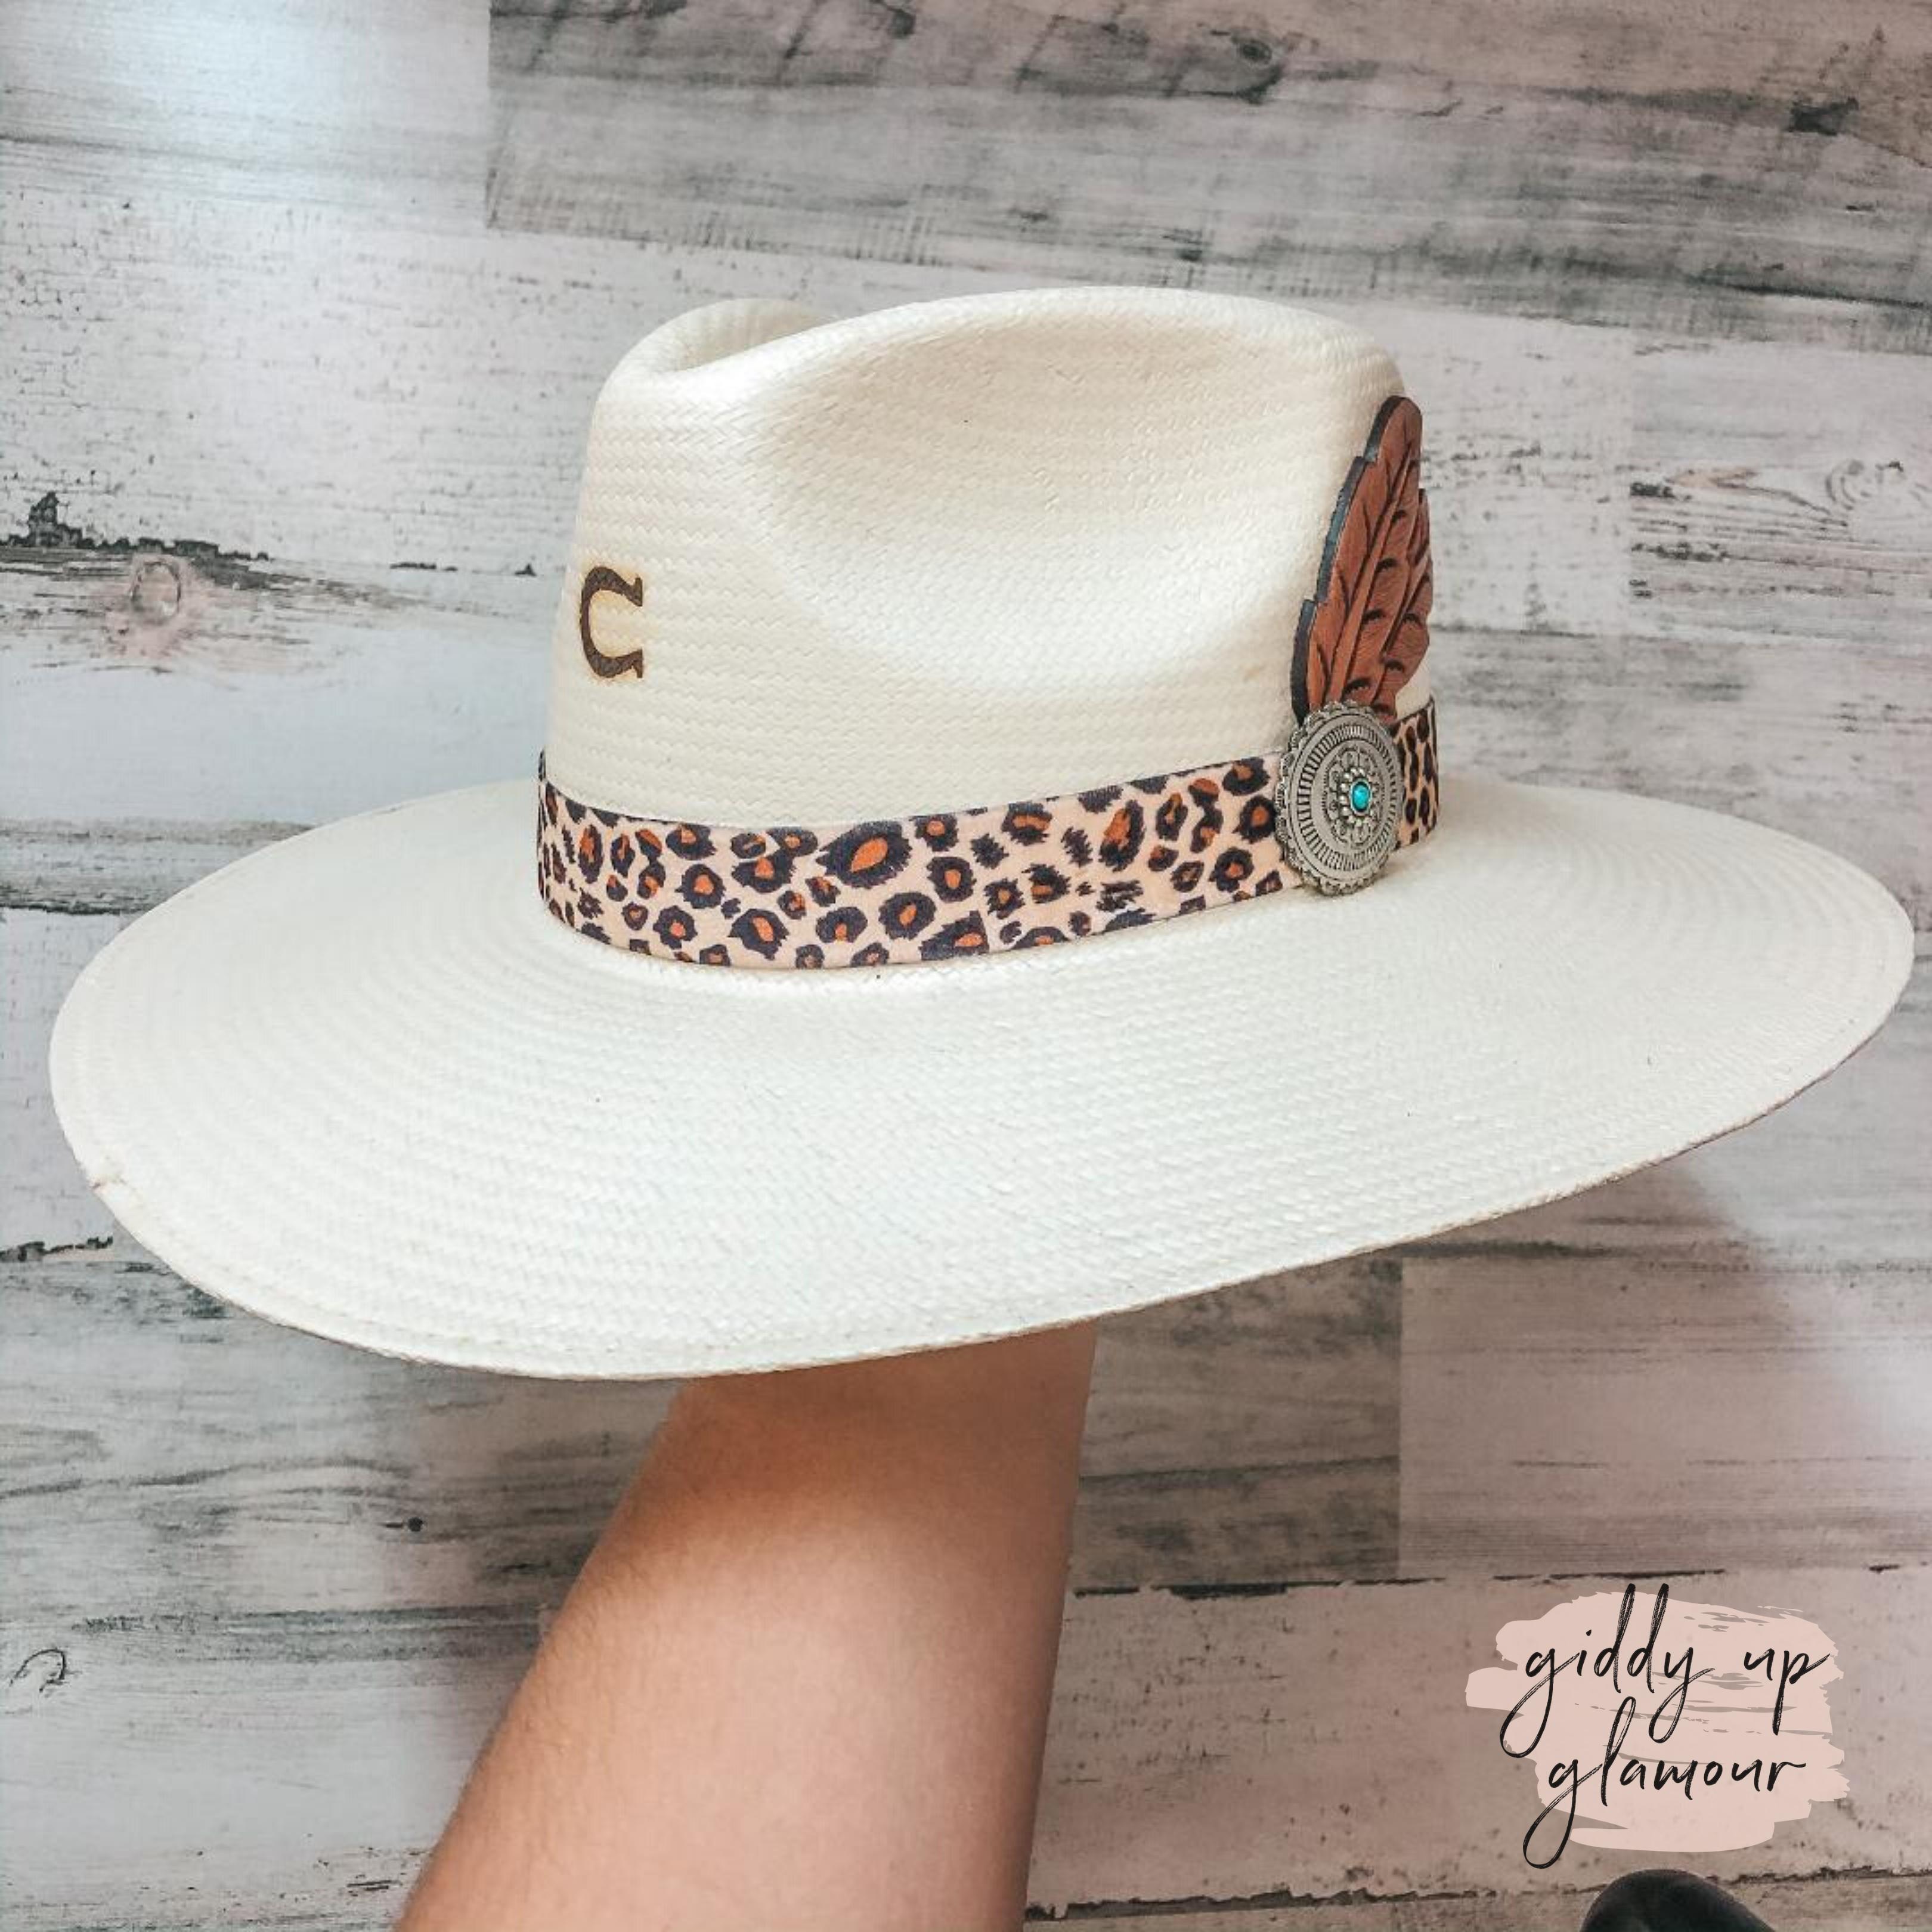 Charlie 1 Horse Heatseeker Straw Hat With Leopard Band Cowboy Hat Bands Straw Hat Straw Cowboy Hat